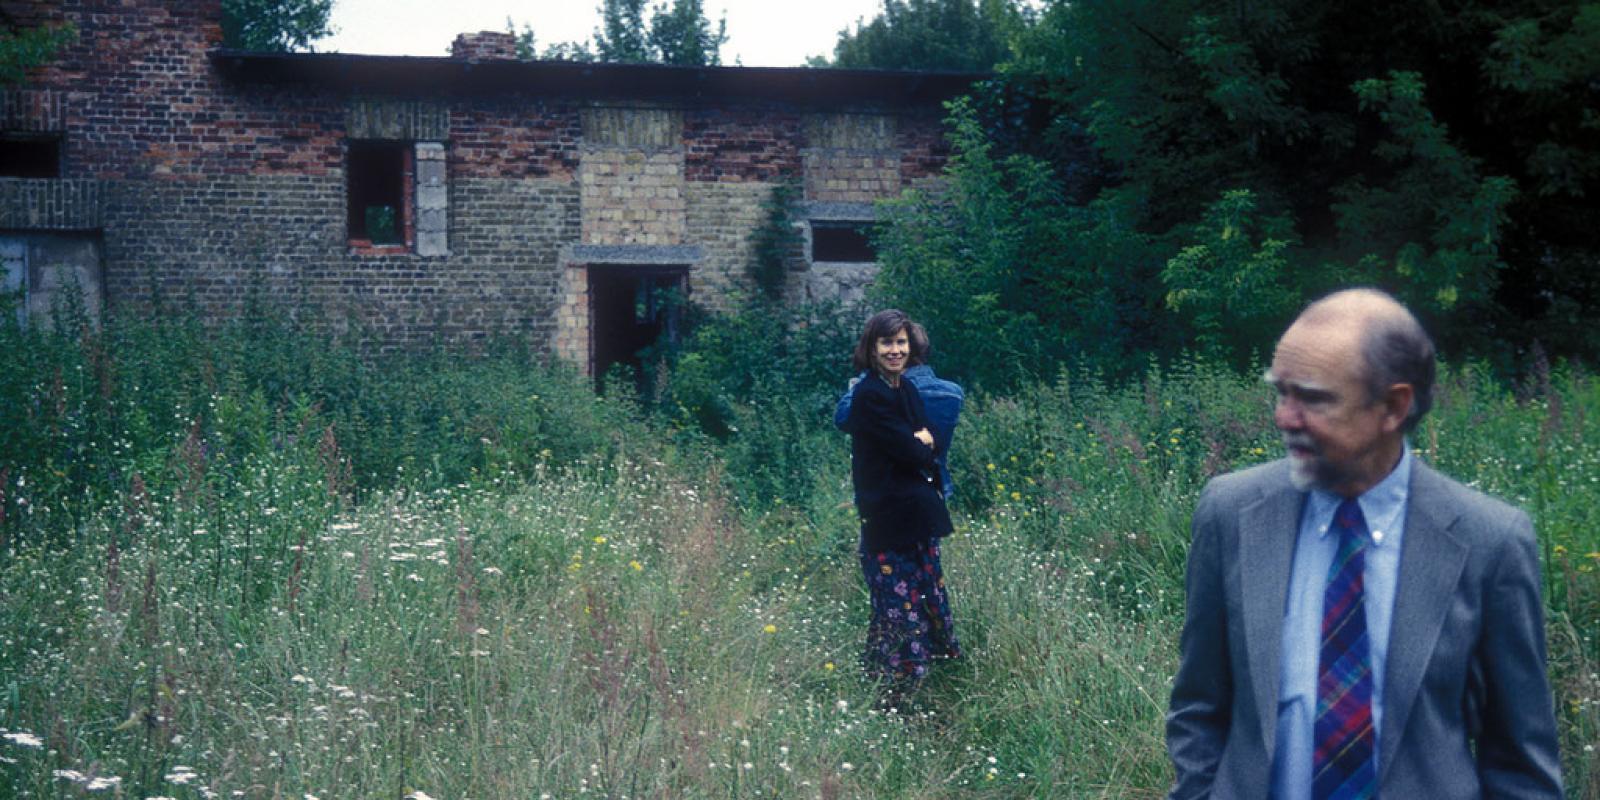 Joan Woodward and John Lyle in 1993